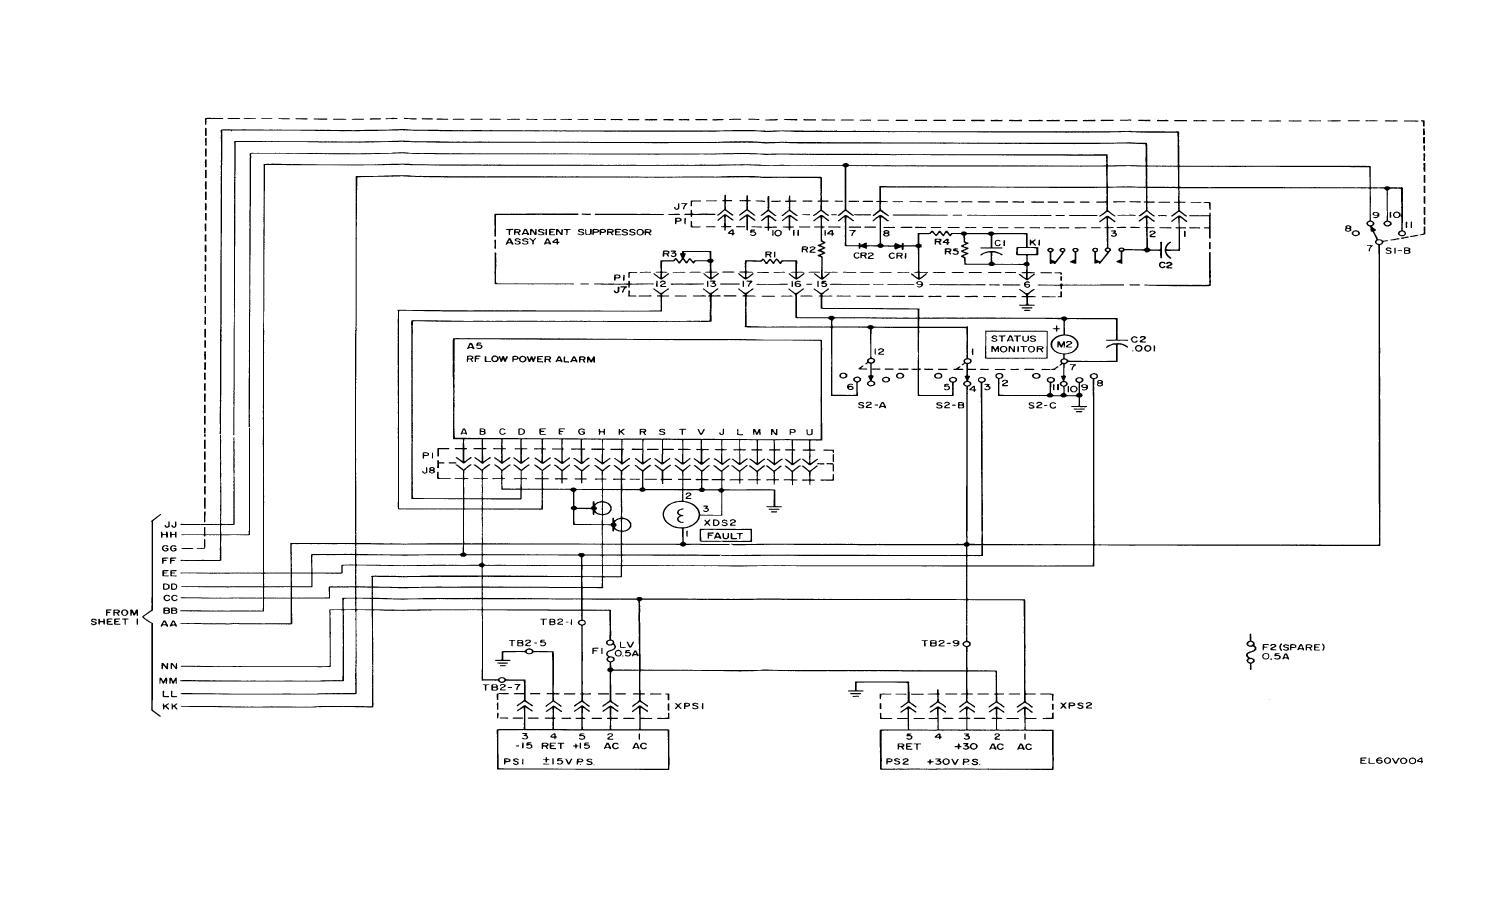 Figure Fo 2 2 Amplifier Mixer Schematic Diagram Sheet